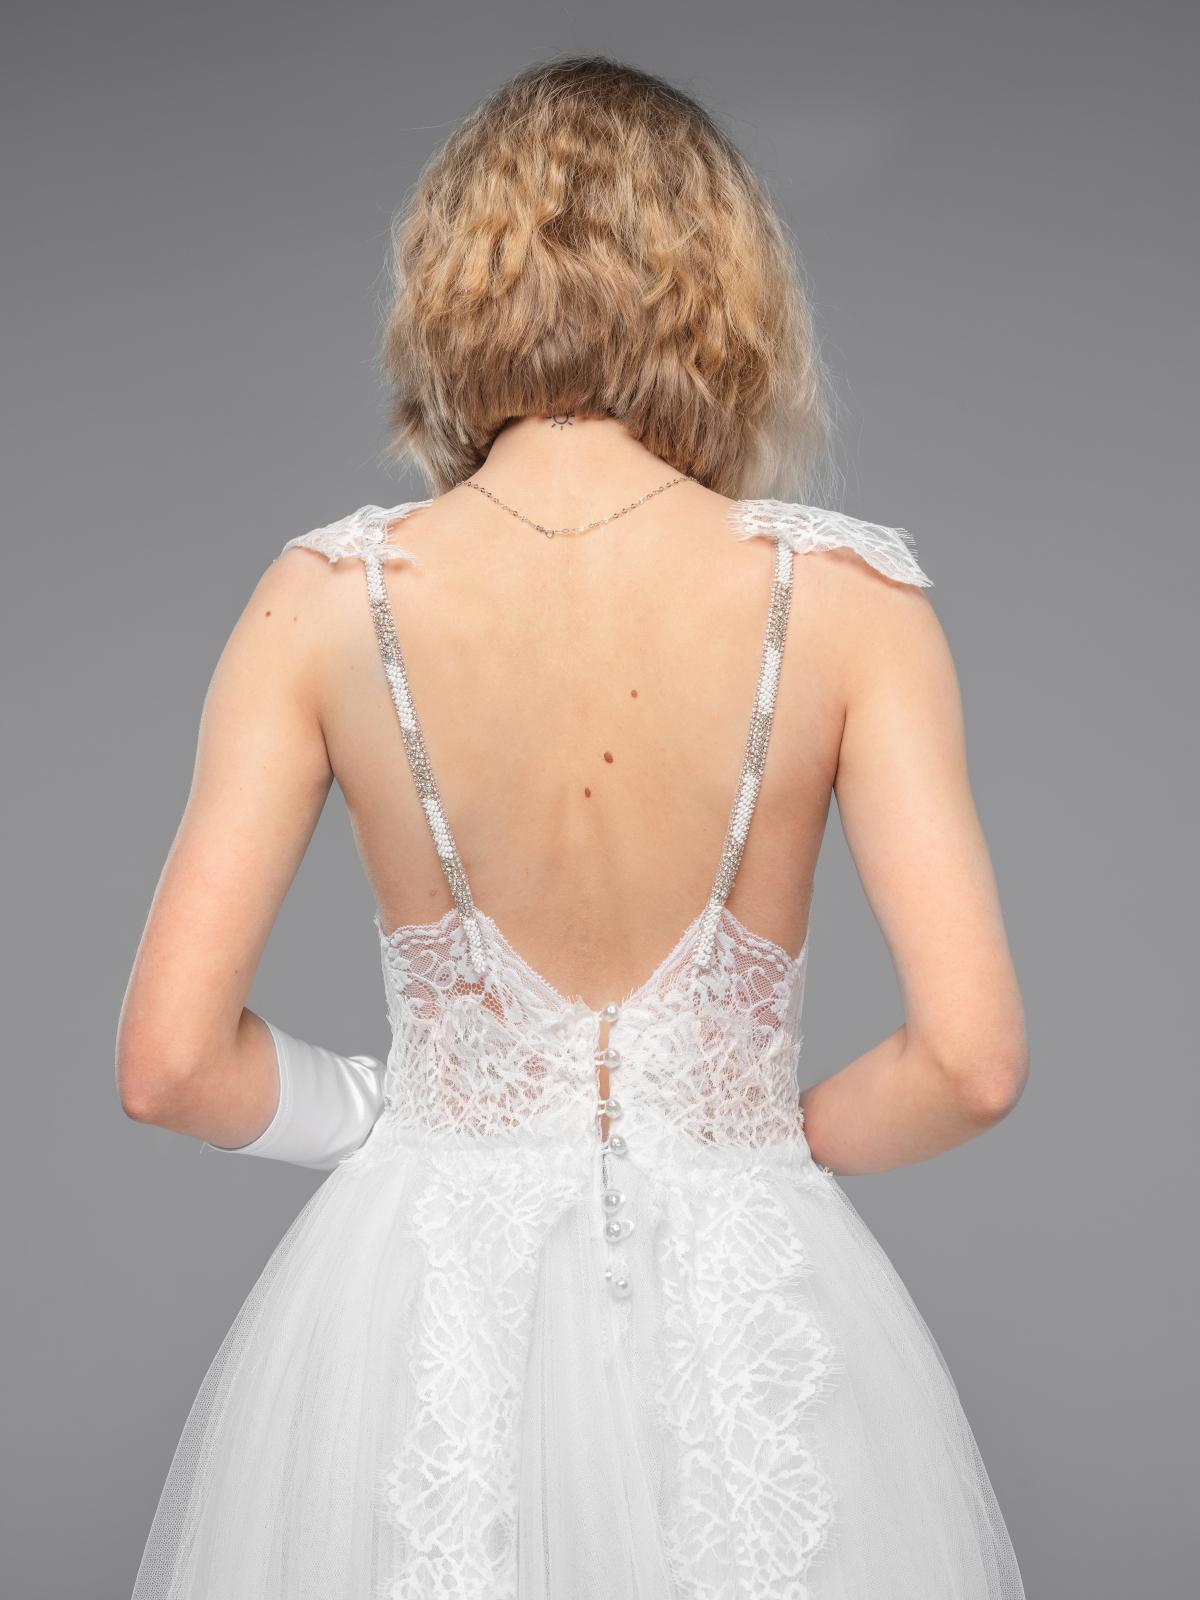 imagen-vestido-virtuosy-colección-hoovervirtuosity-Inma-Saurina